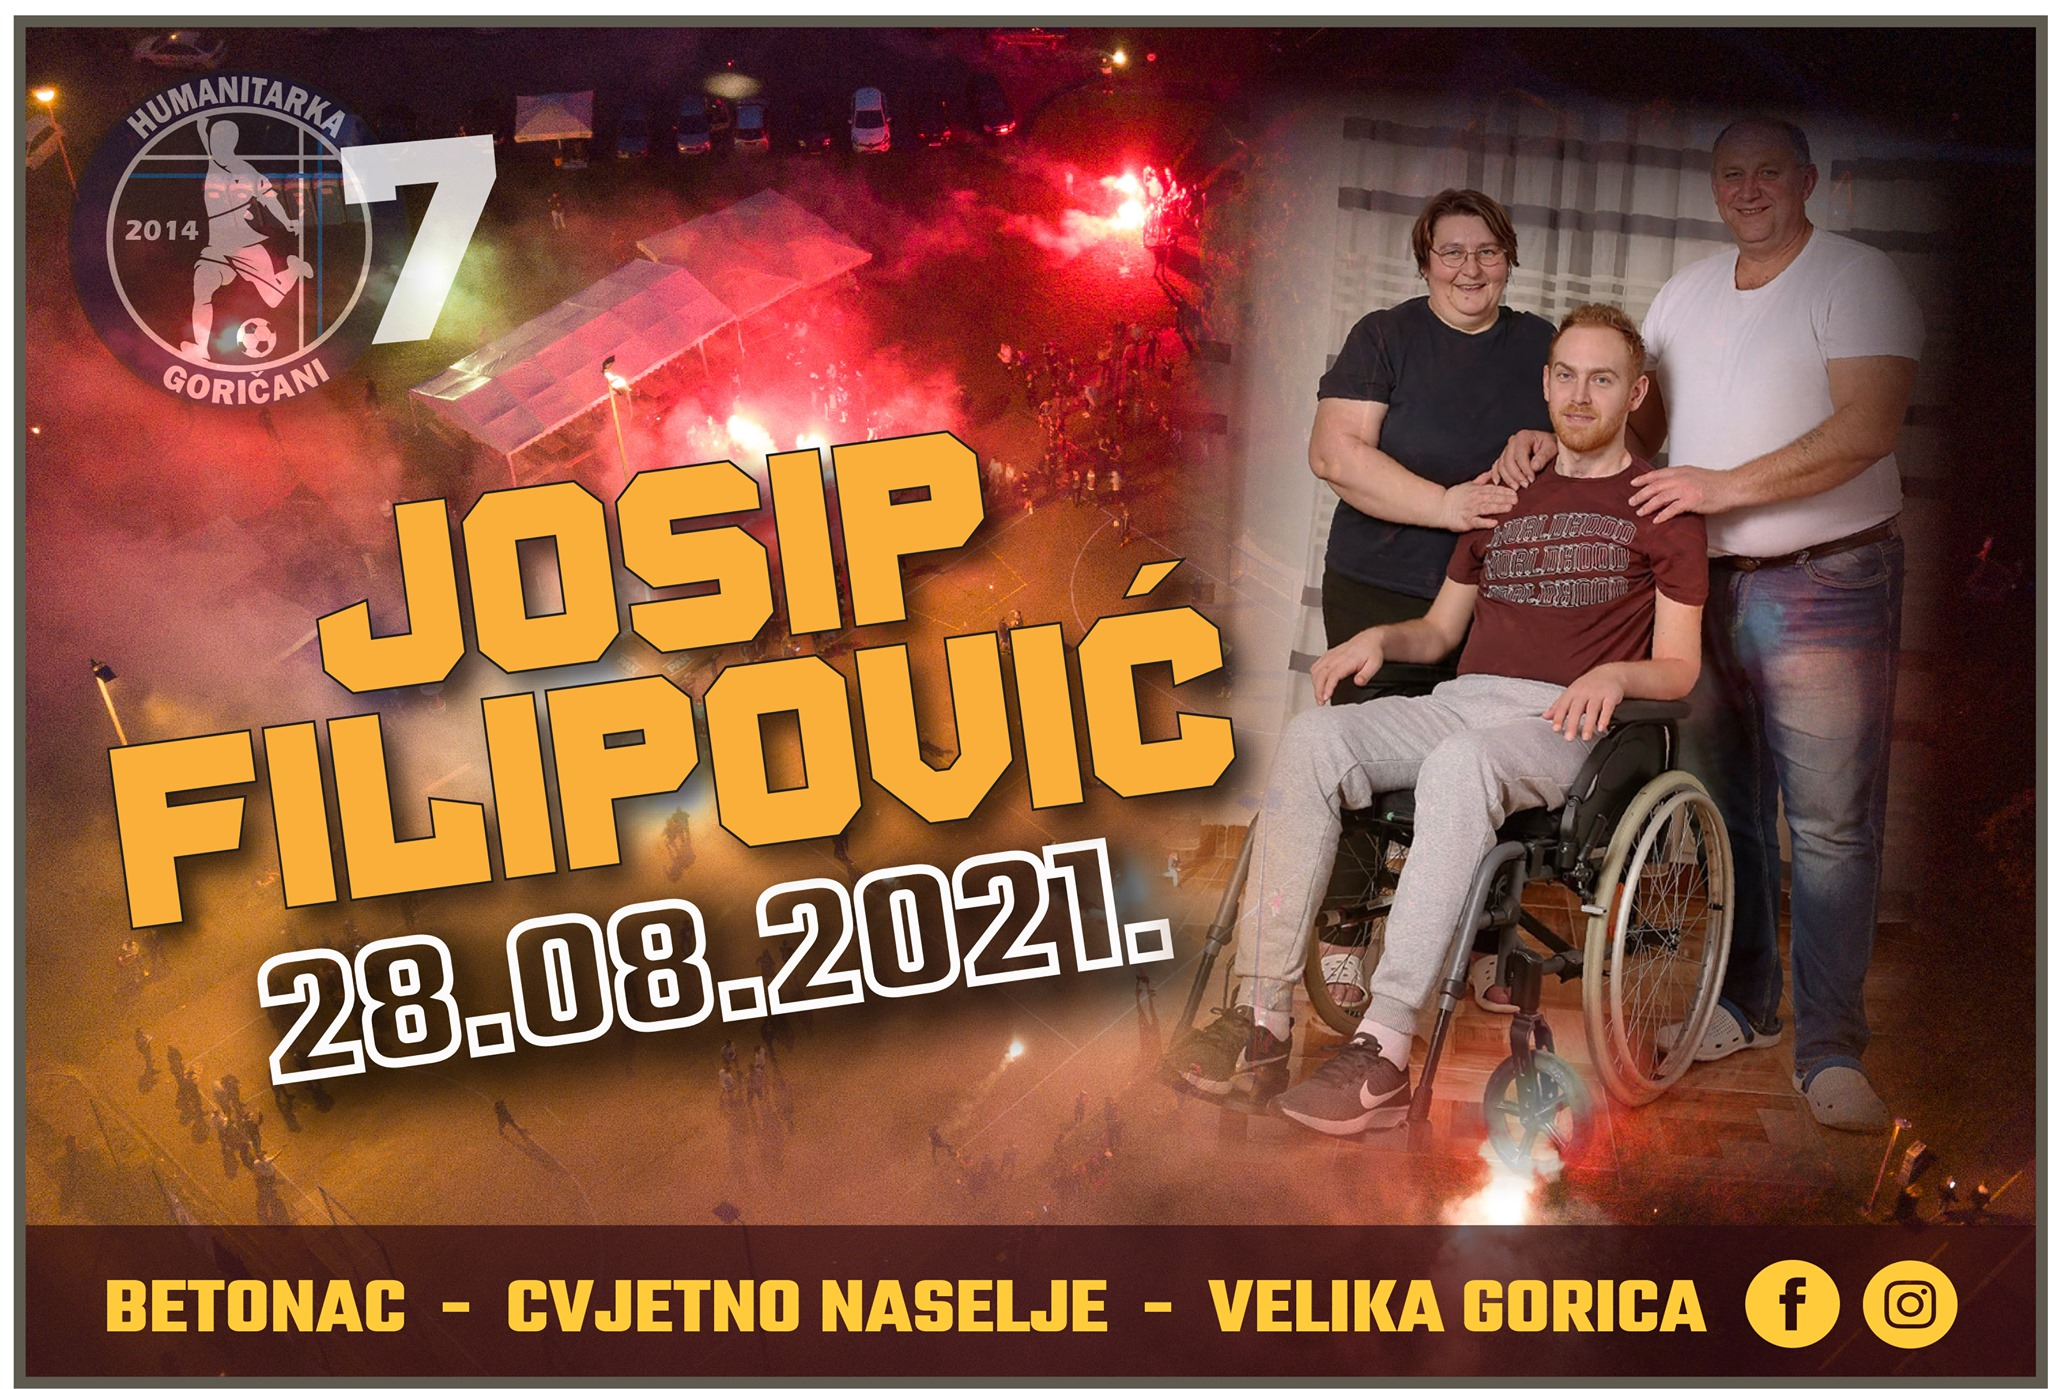 goričani humanitarka josip filipović trofej dinamo